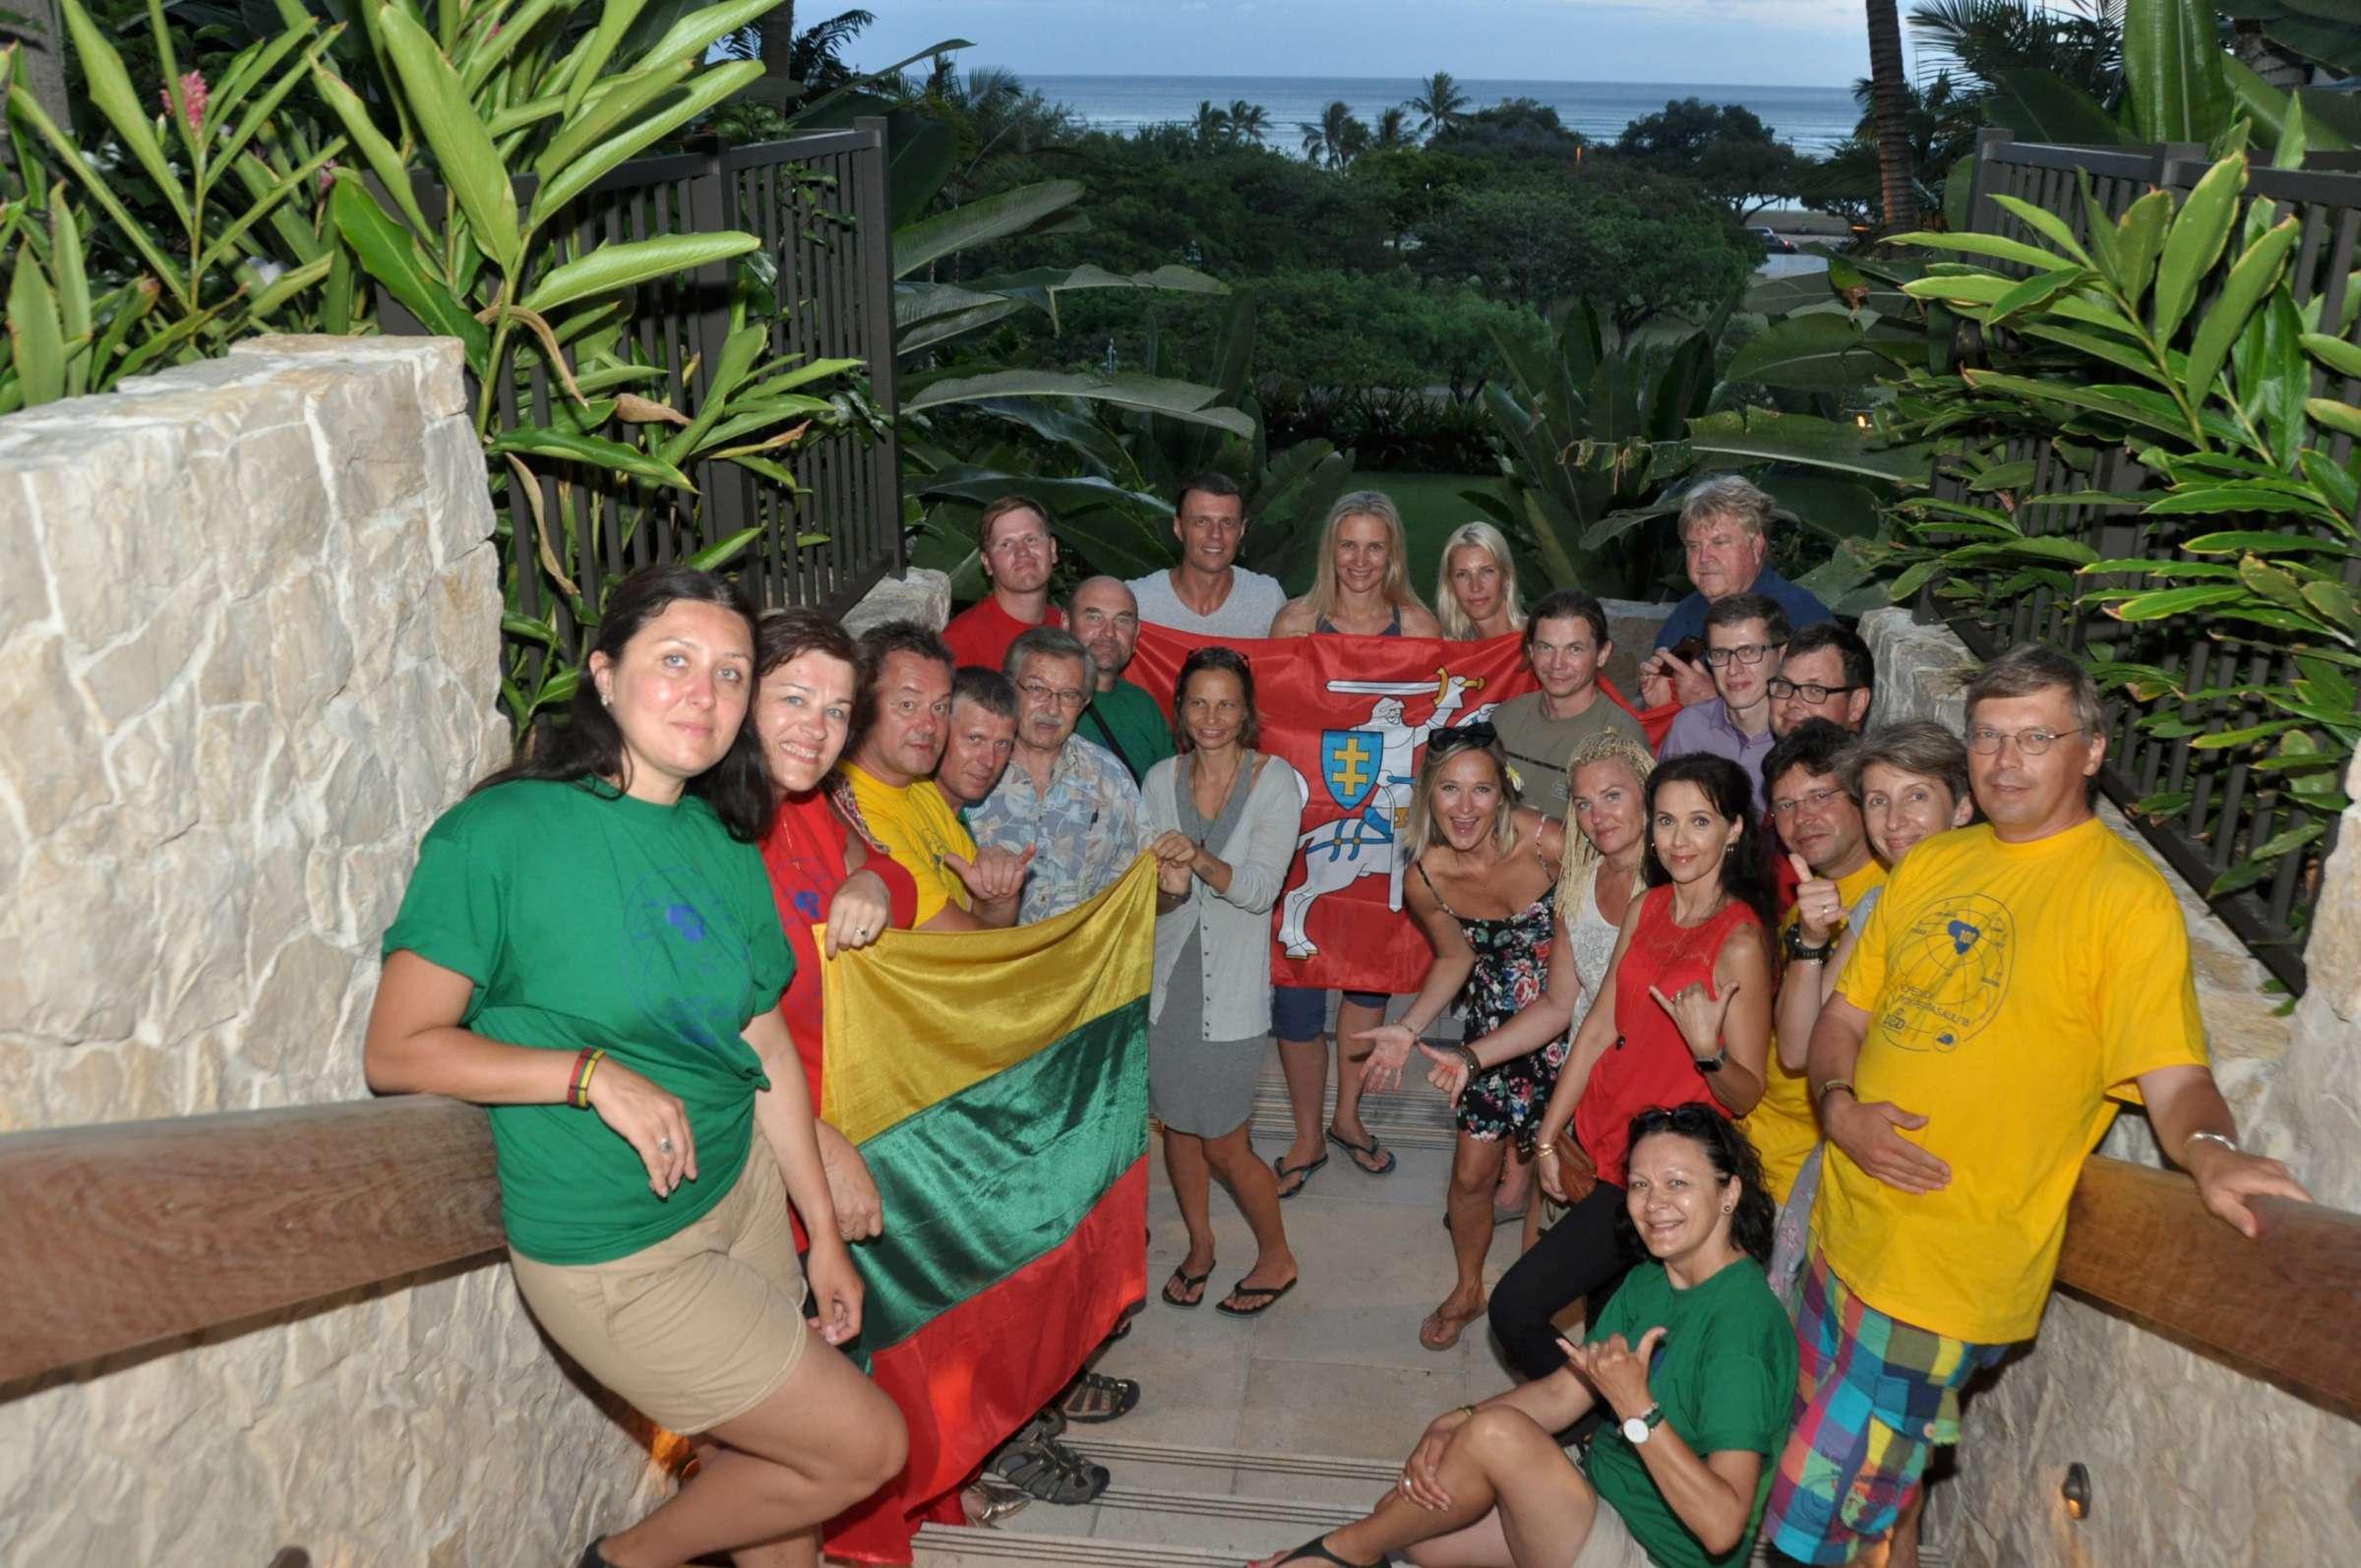 Ekspedicijos dalyviai su lietuviu bendruoene Havajuose-2400